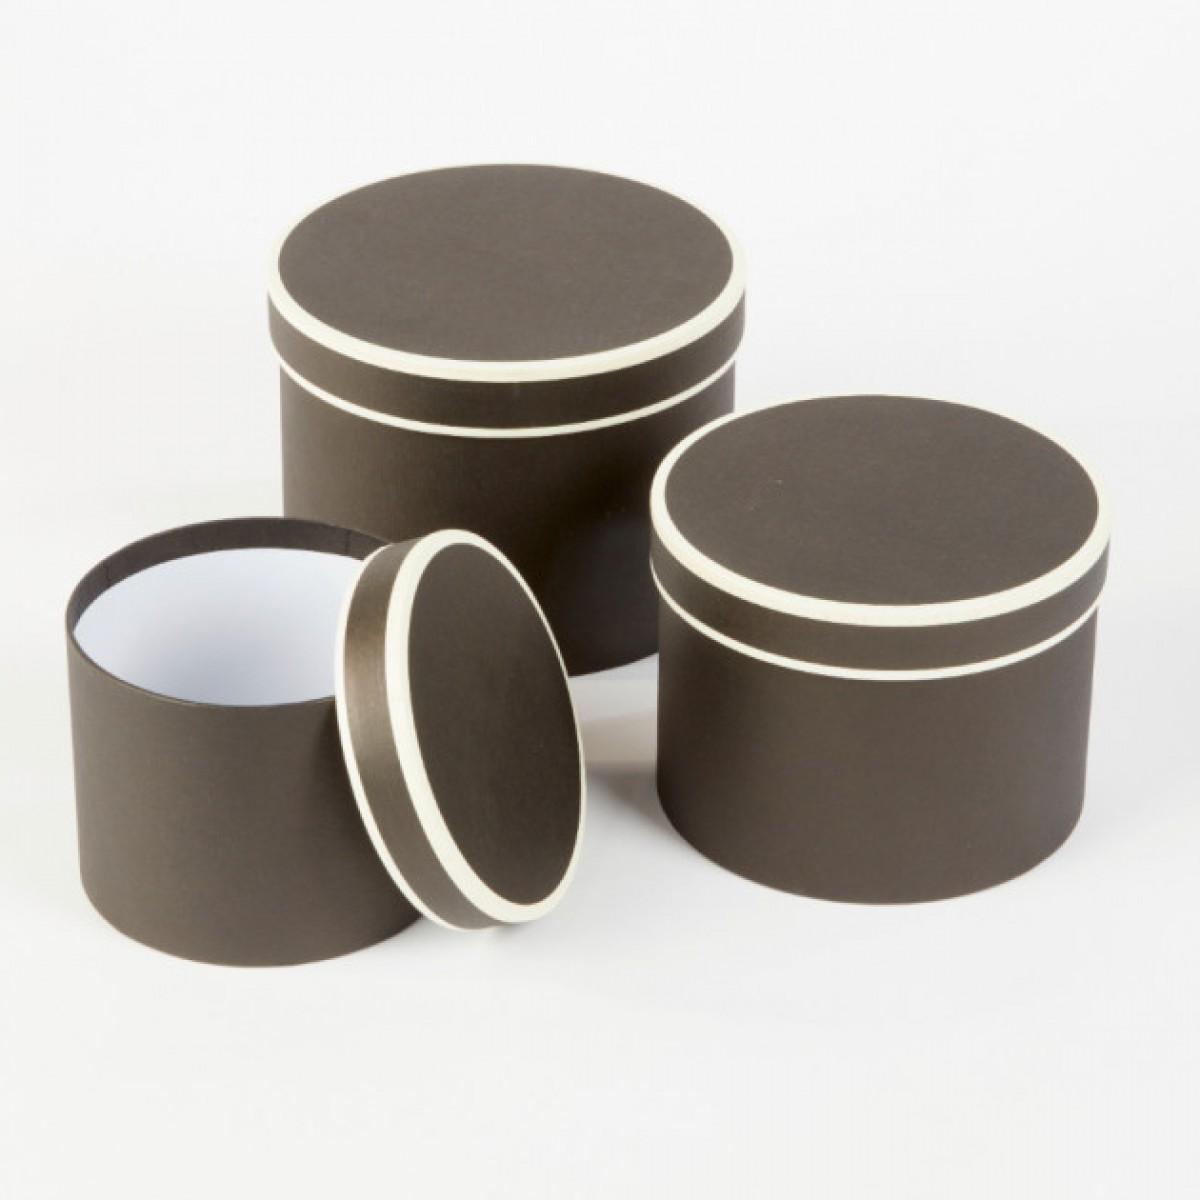 5006 Black/Cream Round Paper Gift Box Lined  - Set of 3